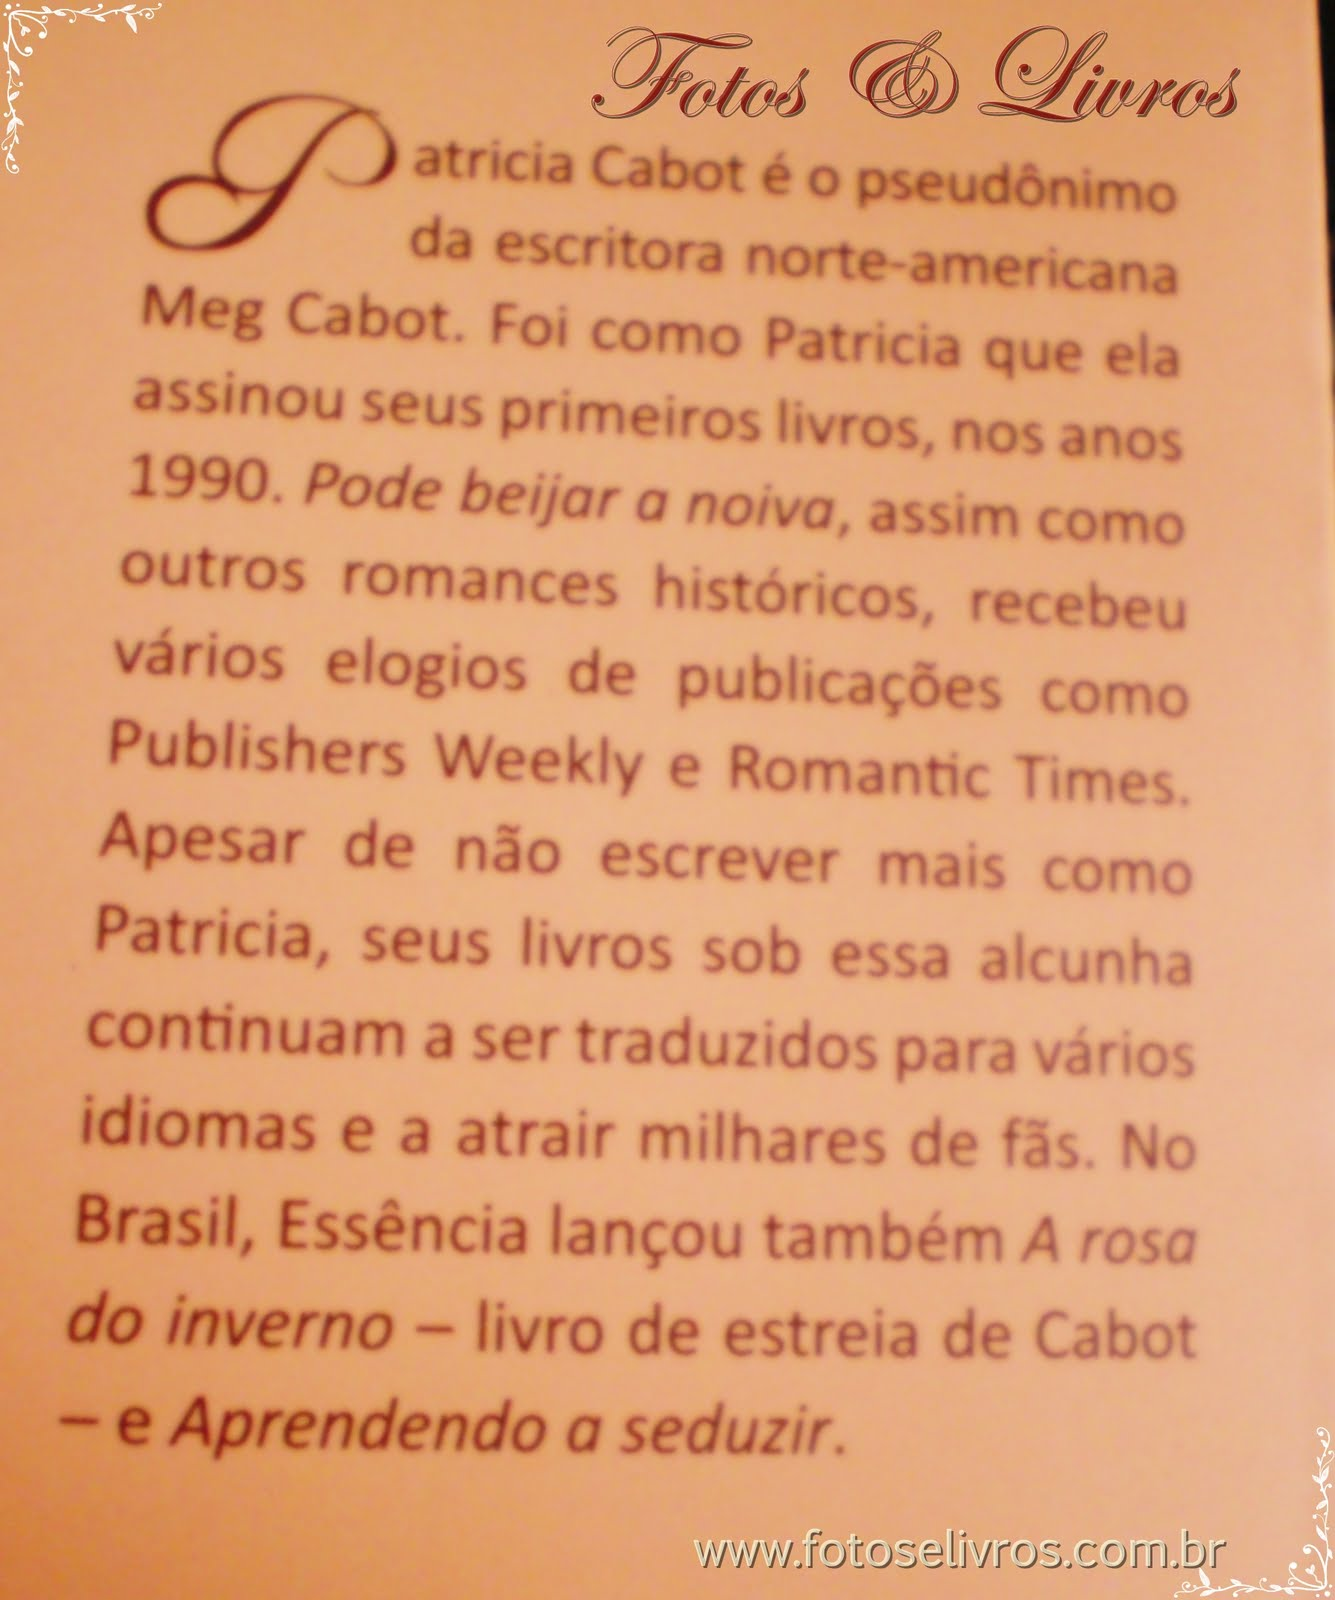 where roses grow wild patricia cabot pdf